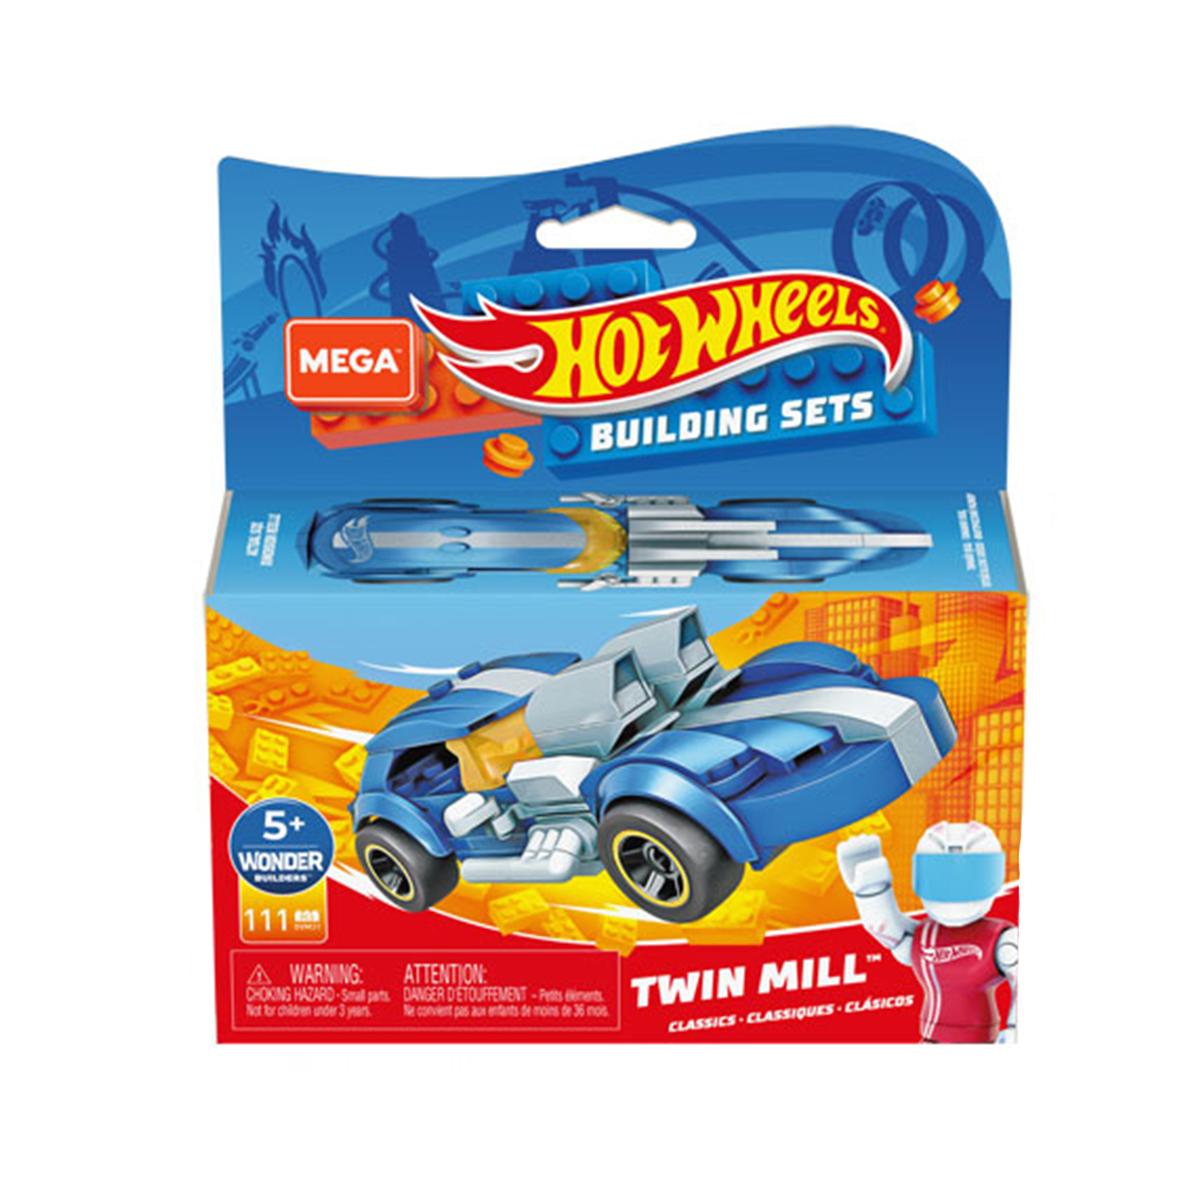 Masinuta Hot Wheels, MegaConstrux, Rockin Racers, GVM31